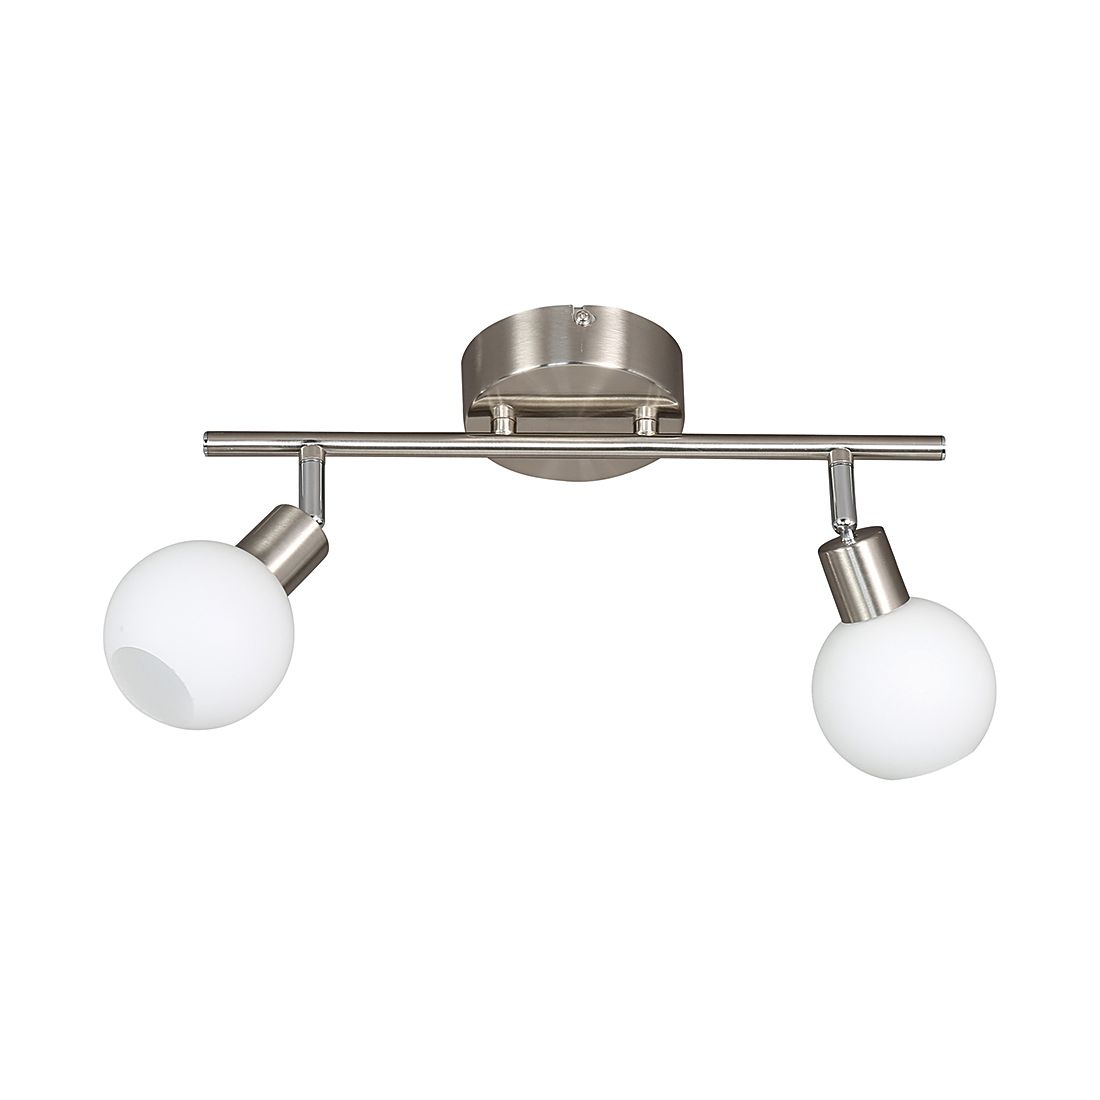 energie A+, Plafondlamp NOIS metaal-glas 2 lichtbronnen, Action